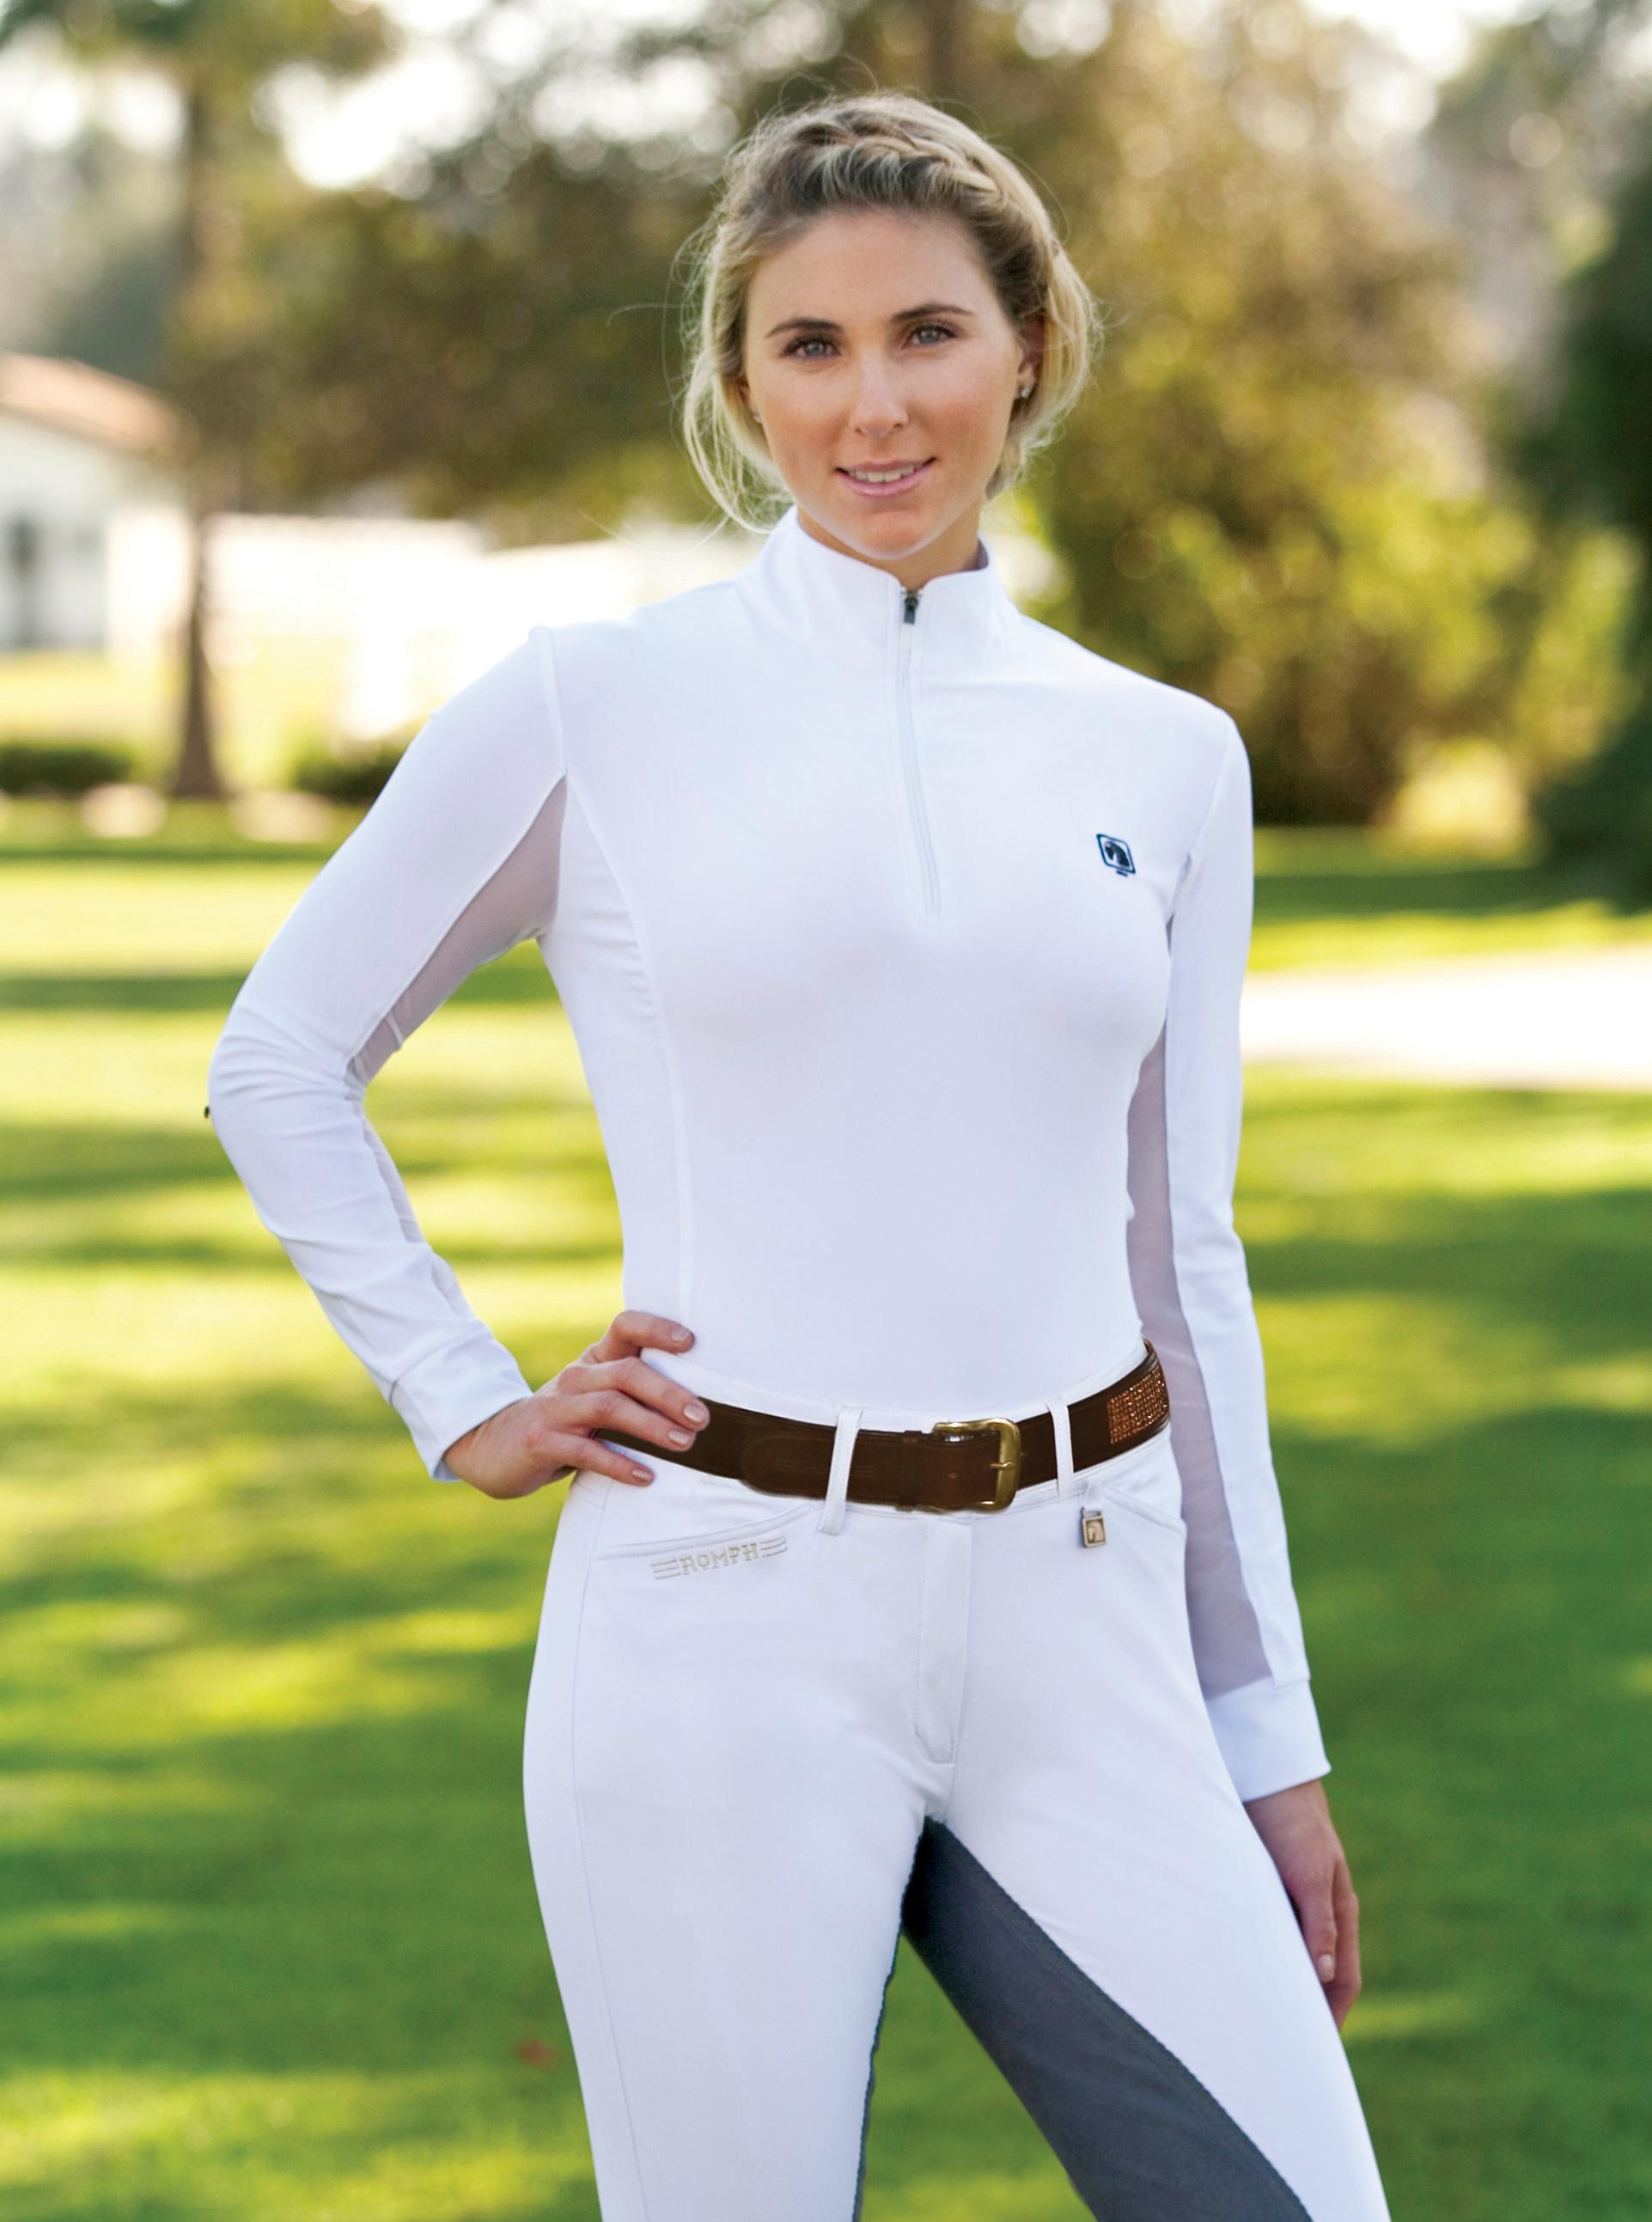 Romfh Pirouette Long Sleeve Show Shirt